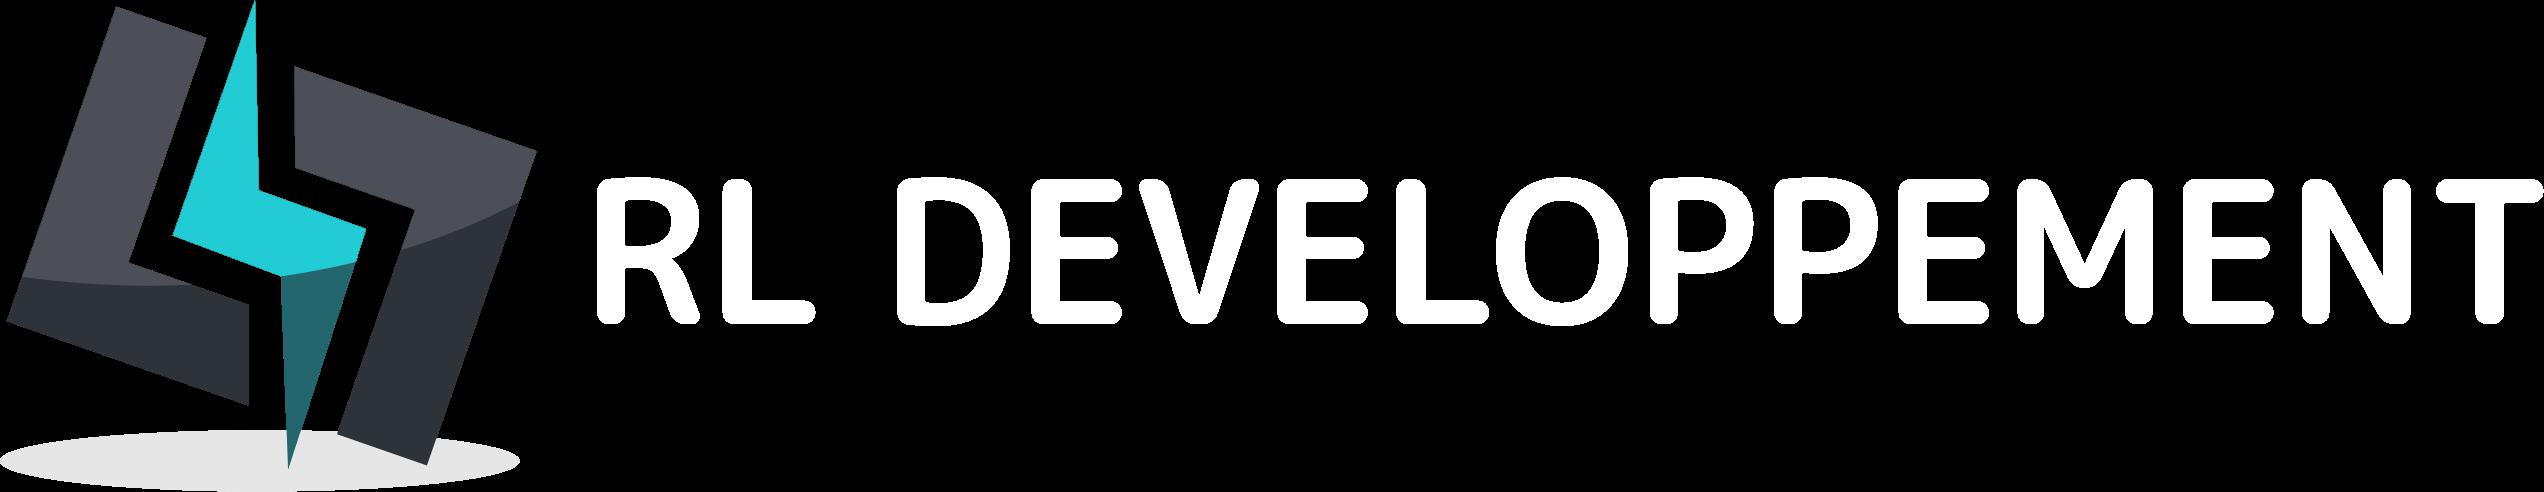 RL DEVELOPPEMENT